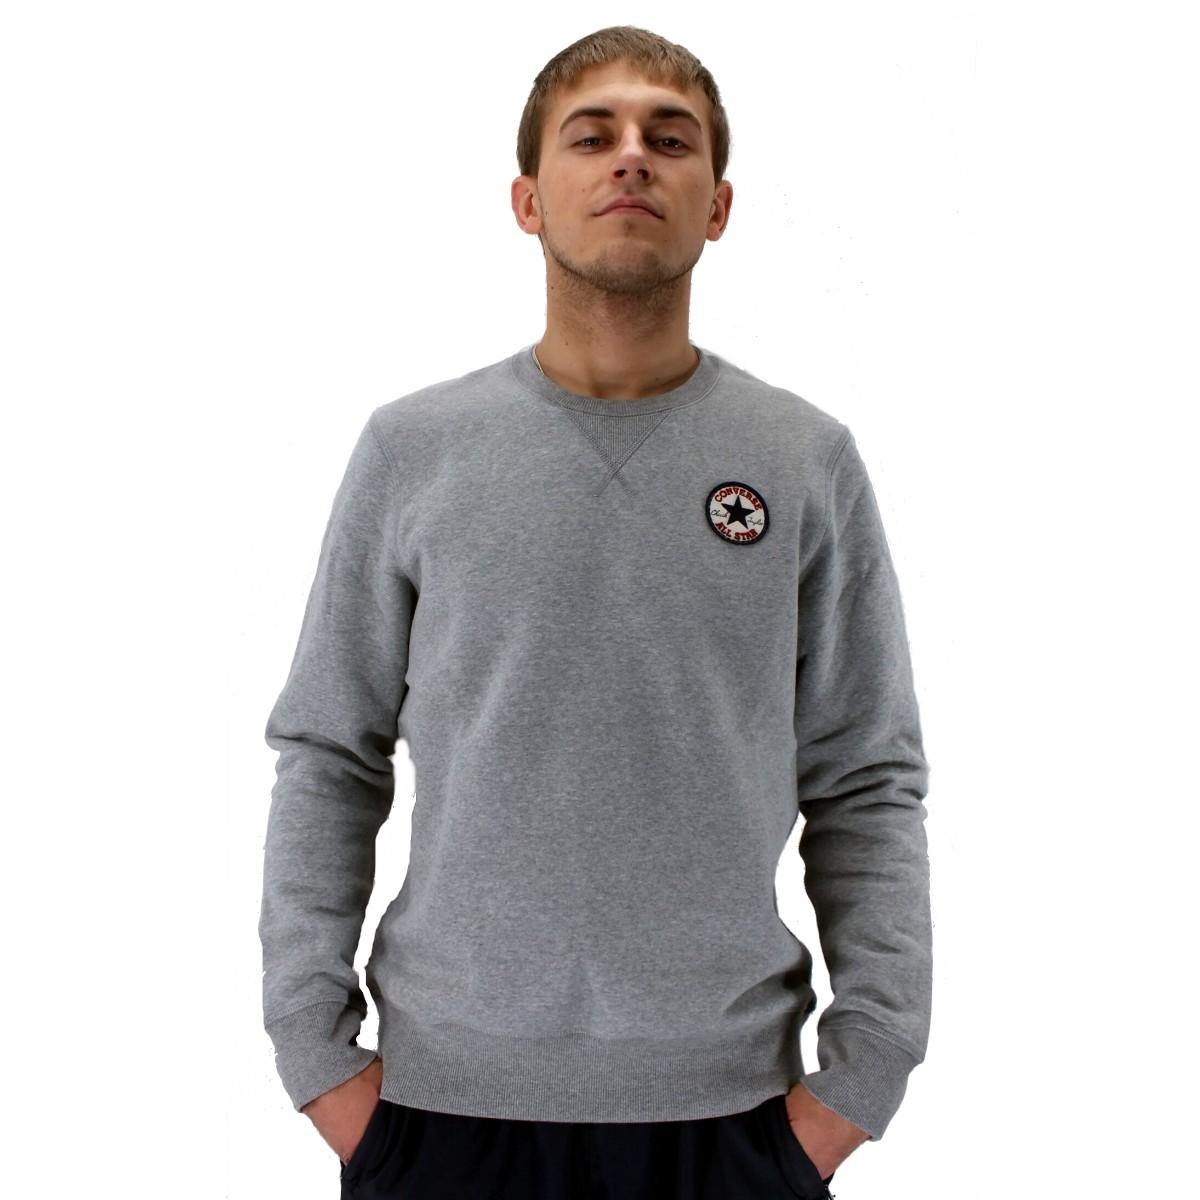 converse core chuck patch fleece pullover sweatshirt herren grau blau schwarz ebay. Black Bedroom Furniture Sets. Home Design Ideas